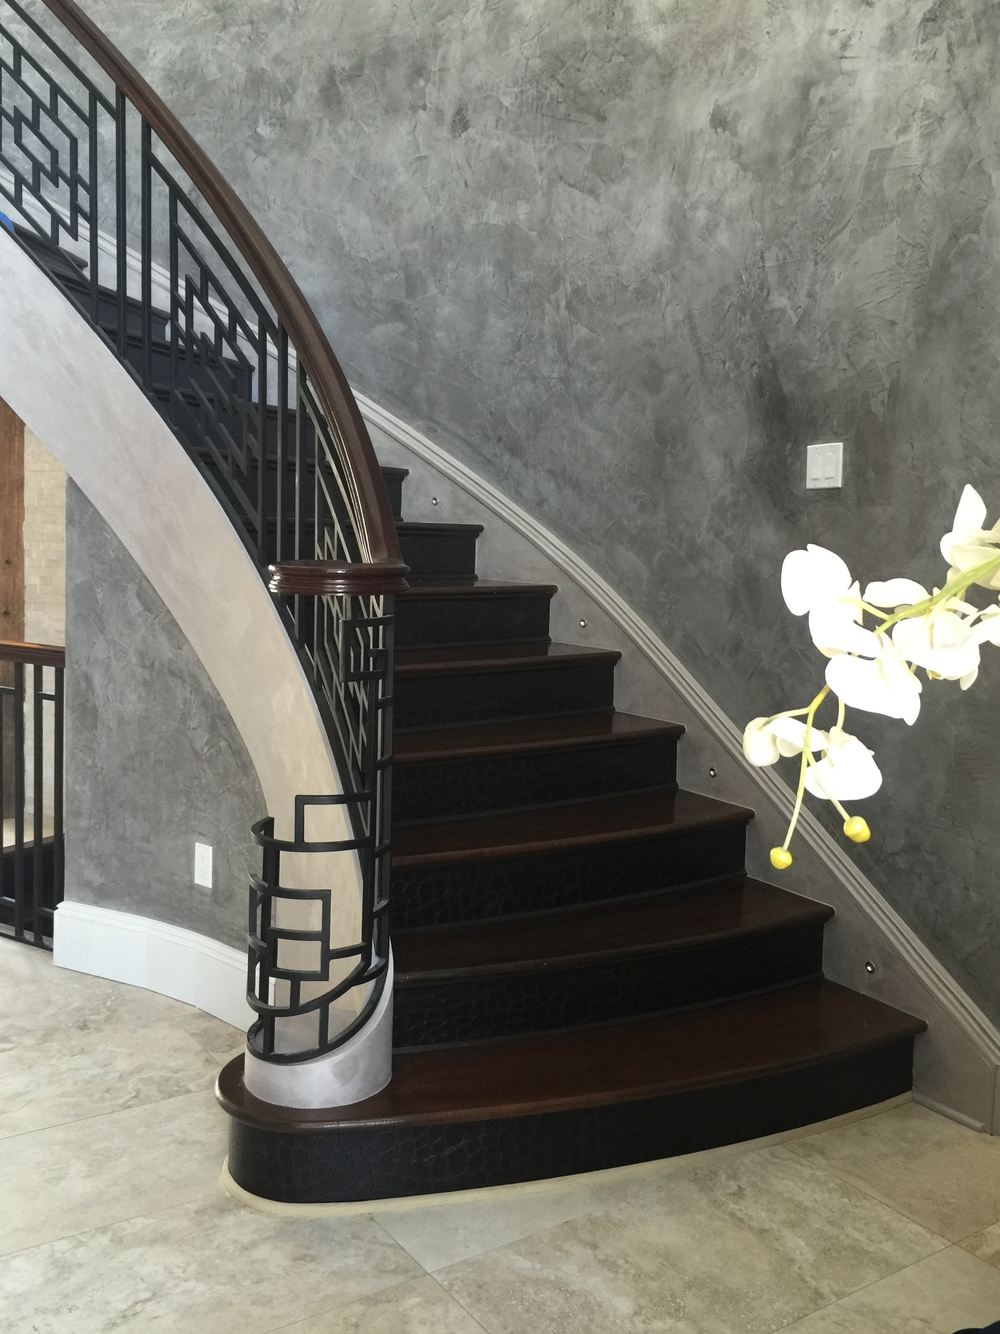 EcoDomo - Jumbo Croc Bourbon - Residential stairs 2.JPG